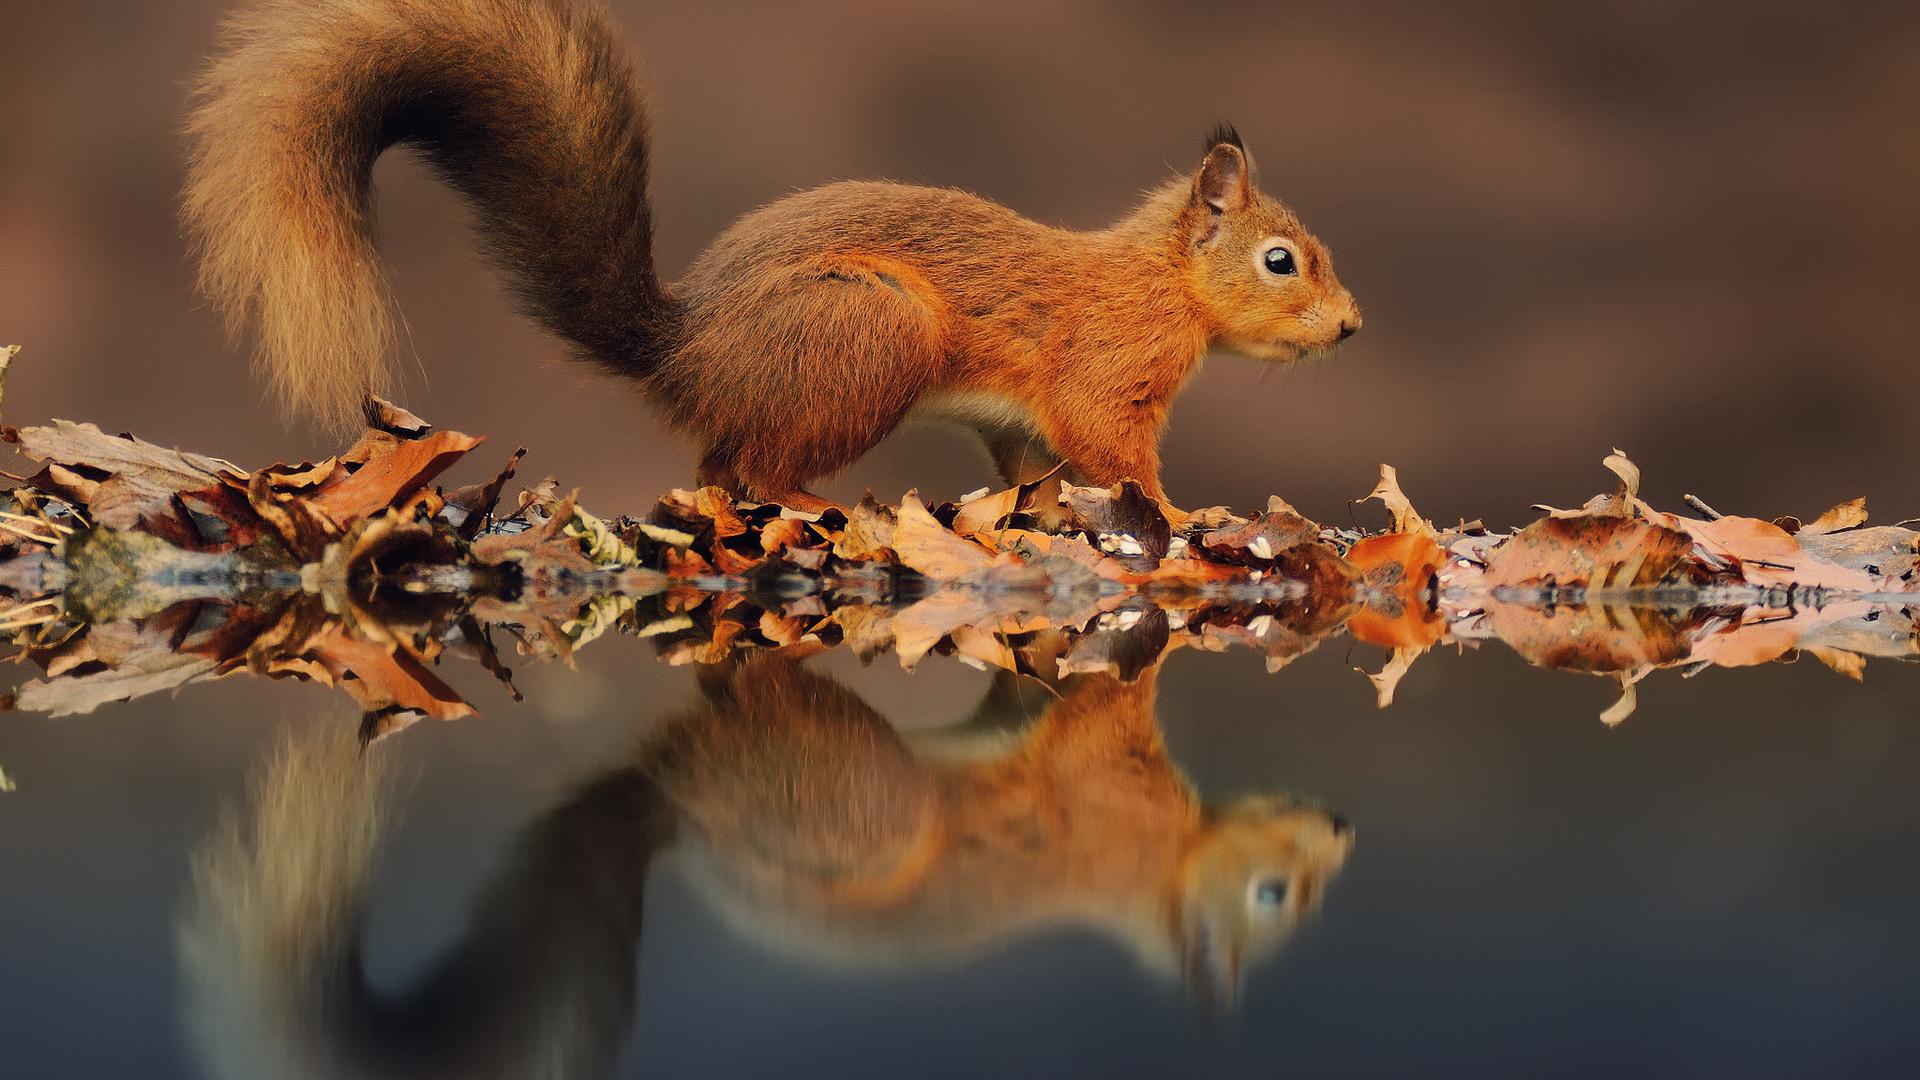 Beautiful Squirrel Wallpaper